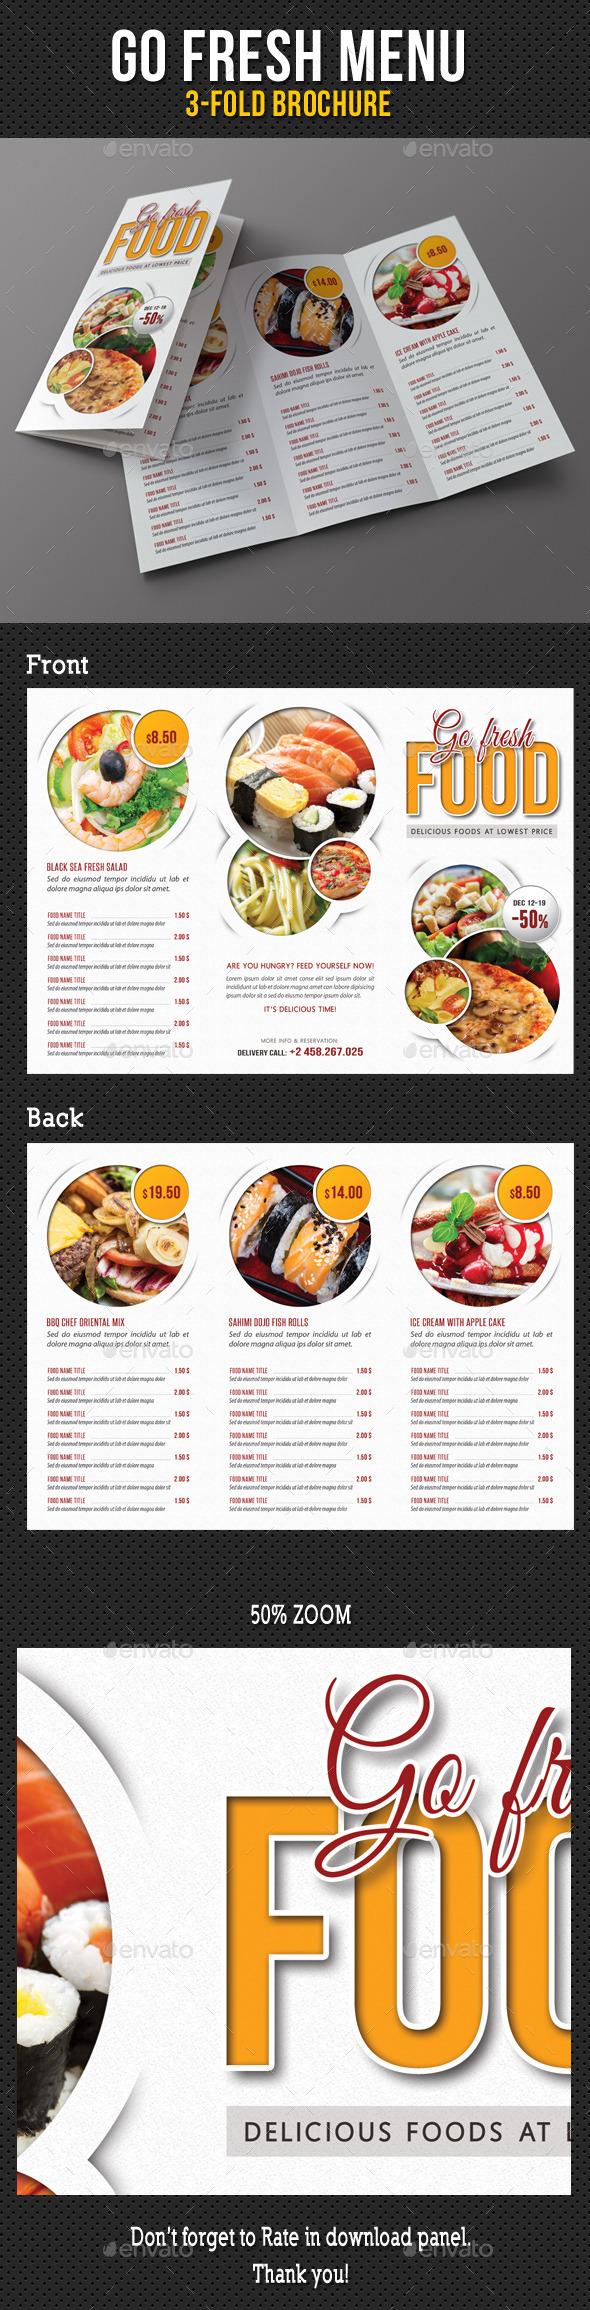 Go Fresh Restaurant Menu 3-Fold Brochure - Food Menus Print Templates